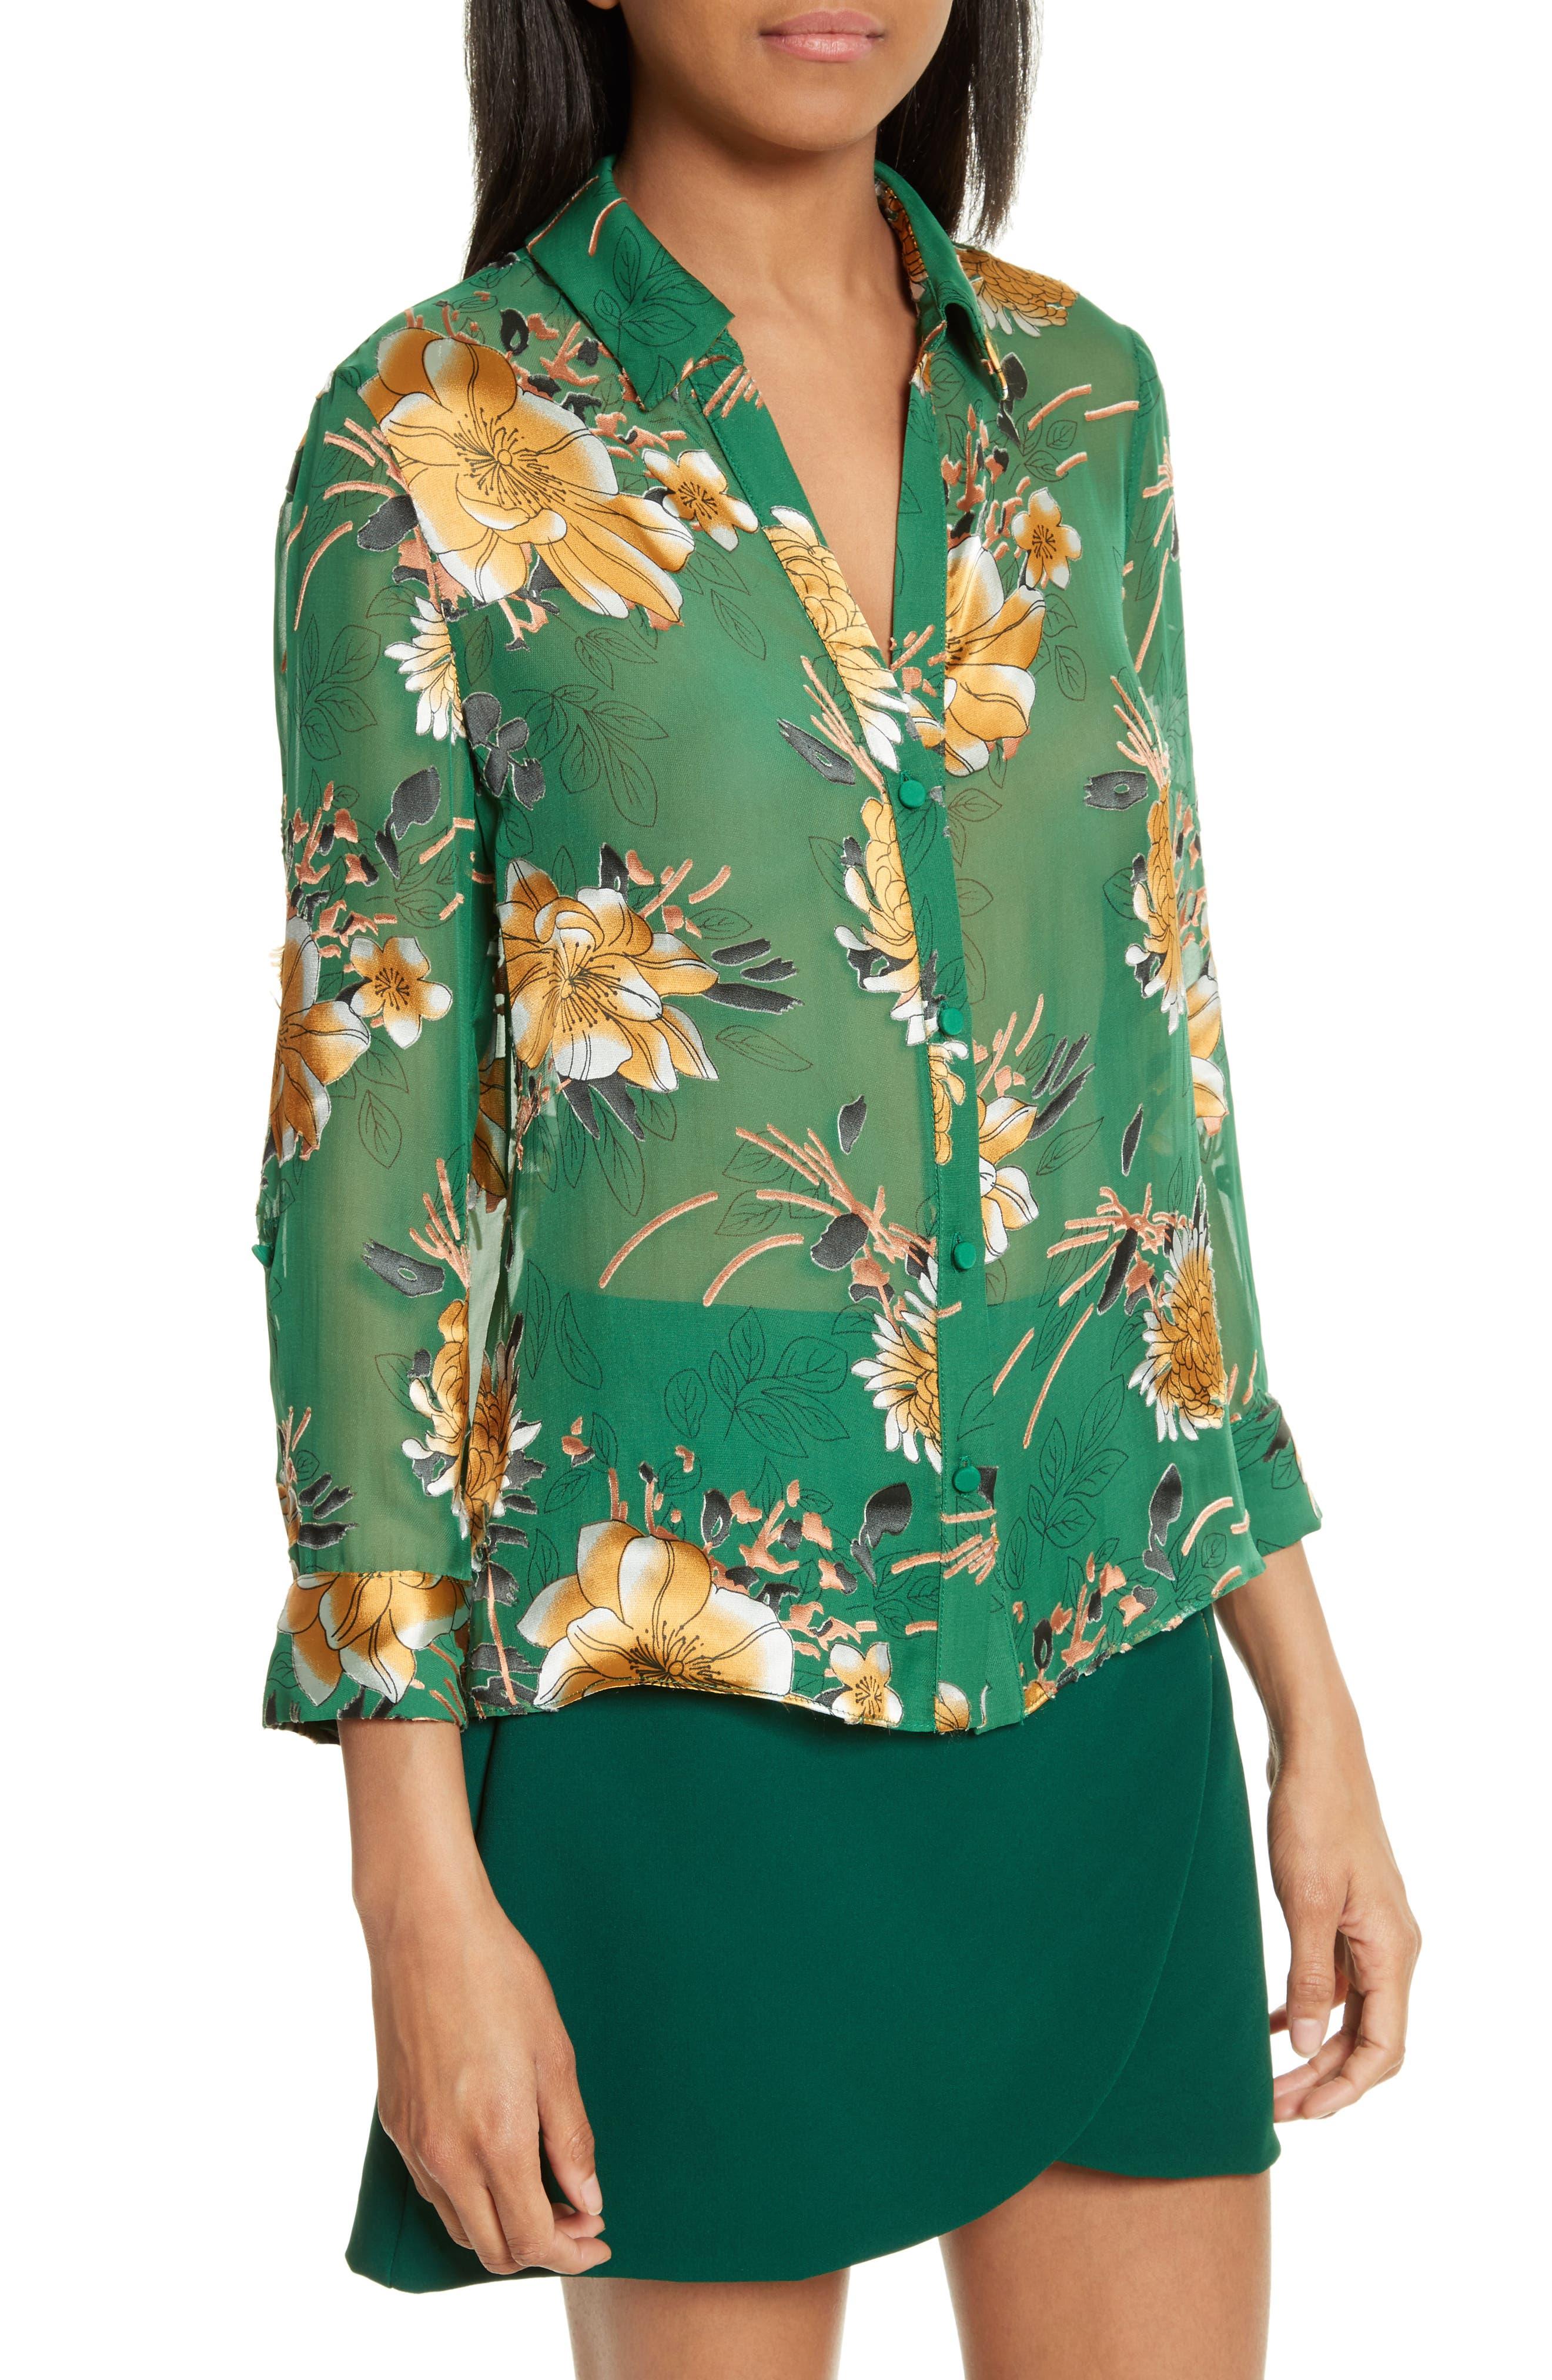 Eloise Roll Sleeve Floral Blouse,                             Alternate thumbnail 4, color,                             308